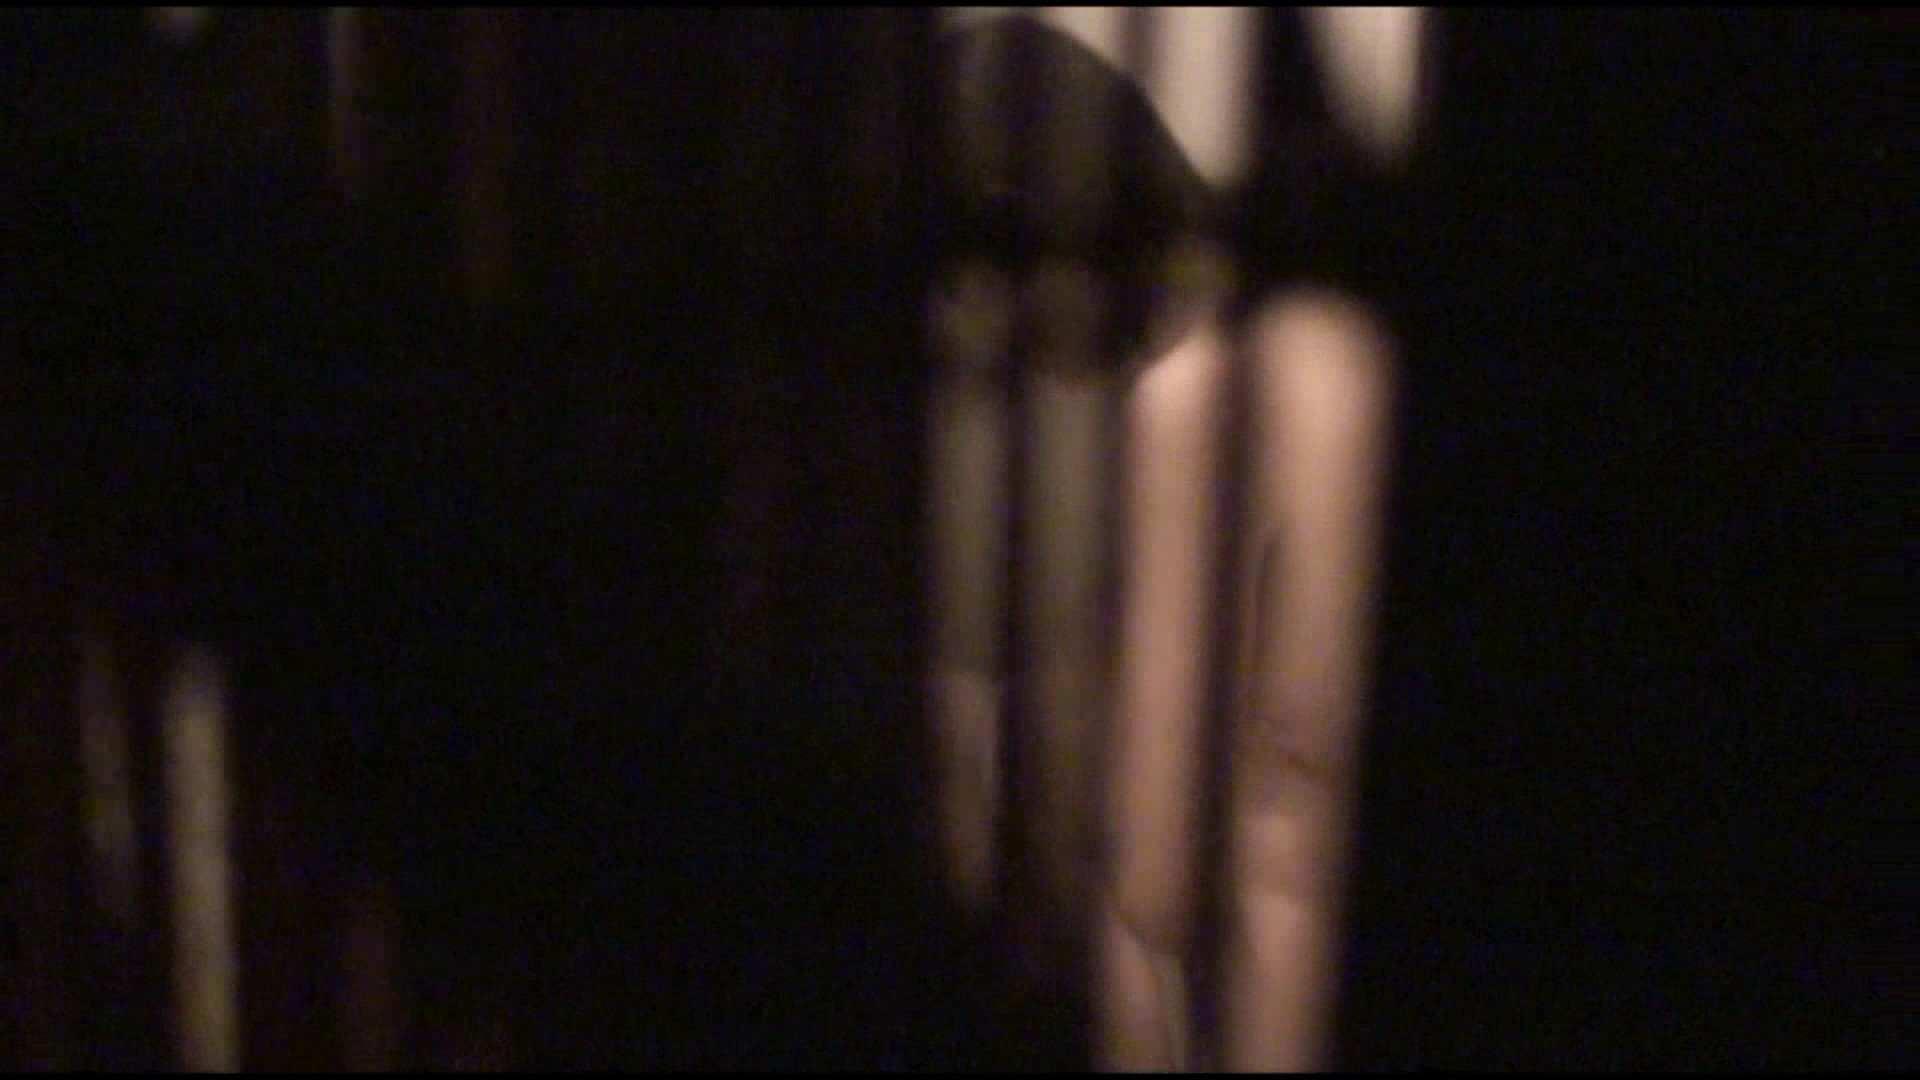 vol.05最高の極上美人!可愛い彼女の裸体をどうぞ!風呂上り鏡チェックも必見! 美人  68pic 50